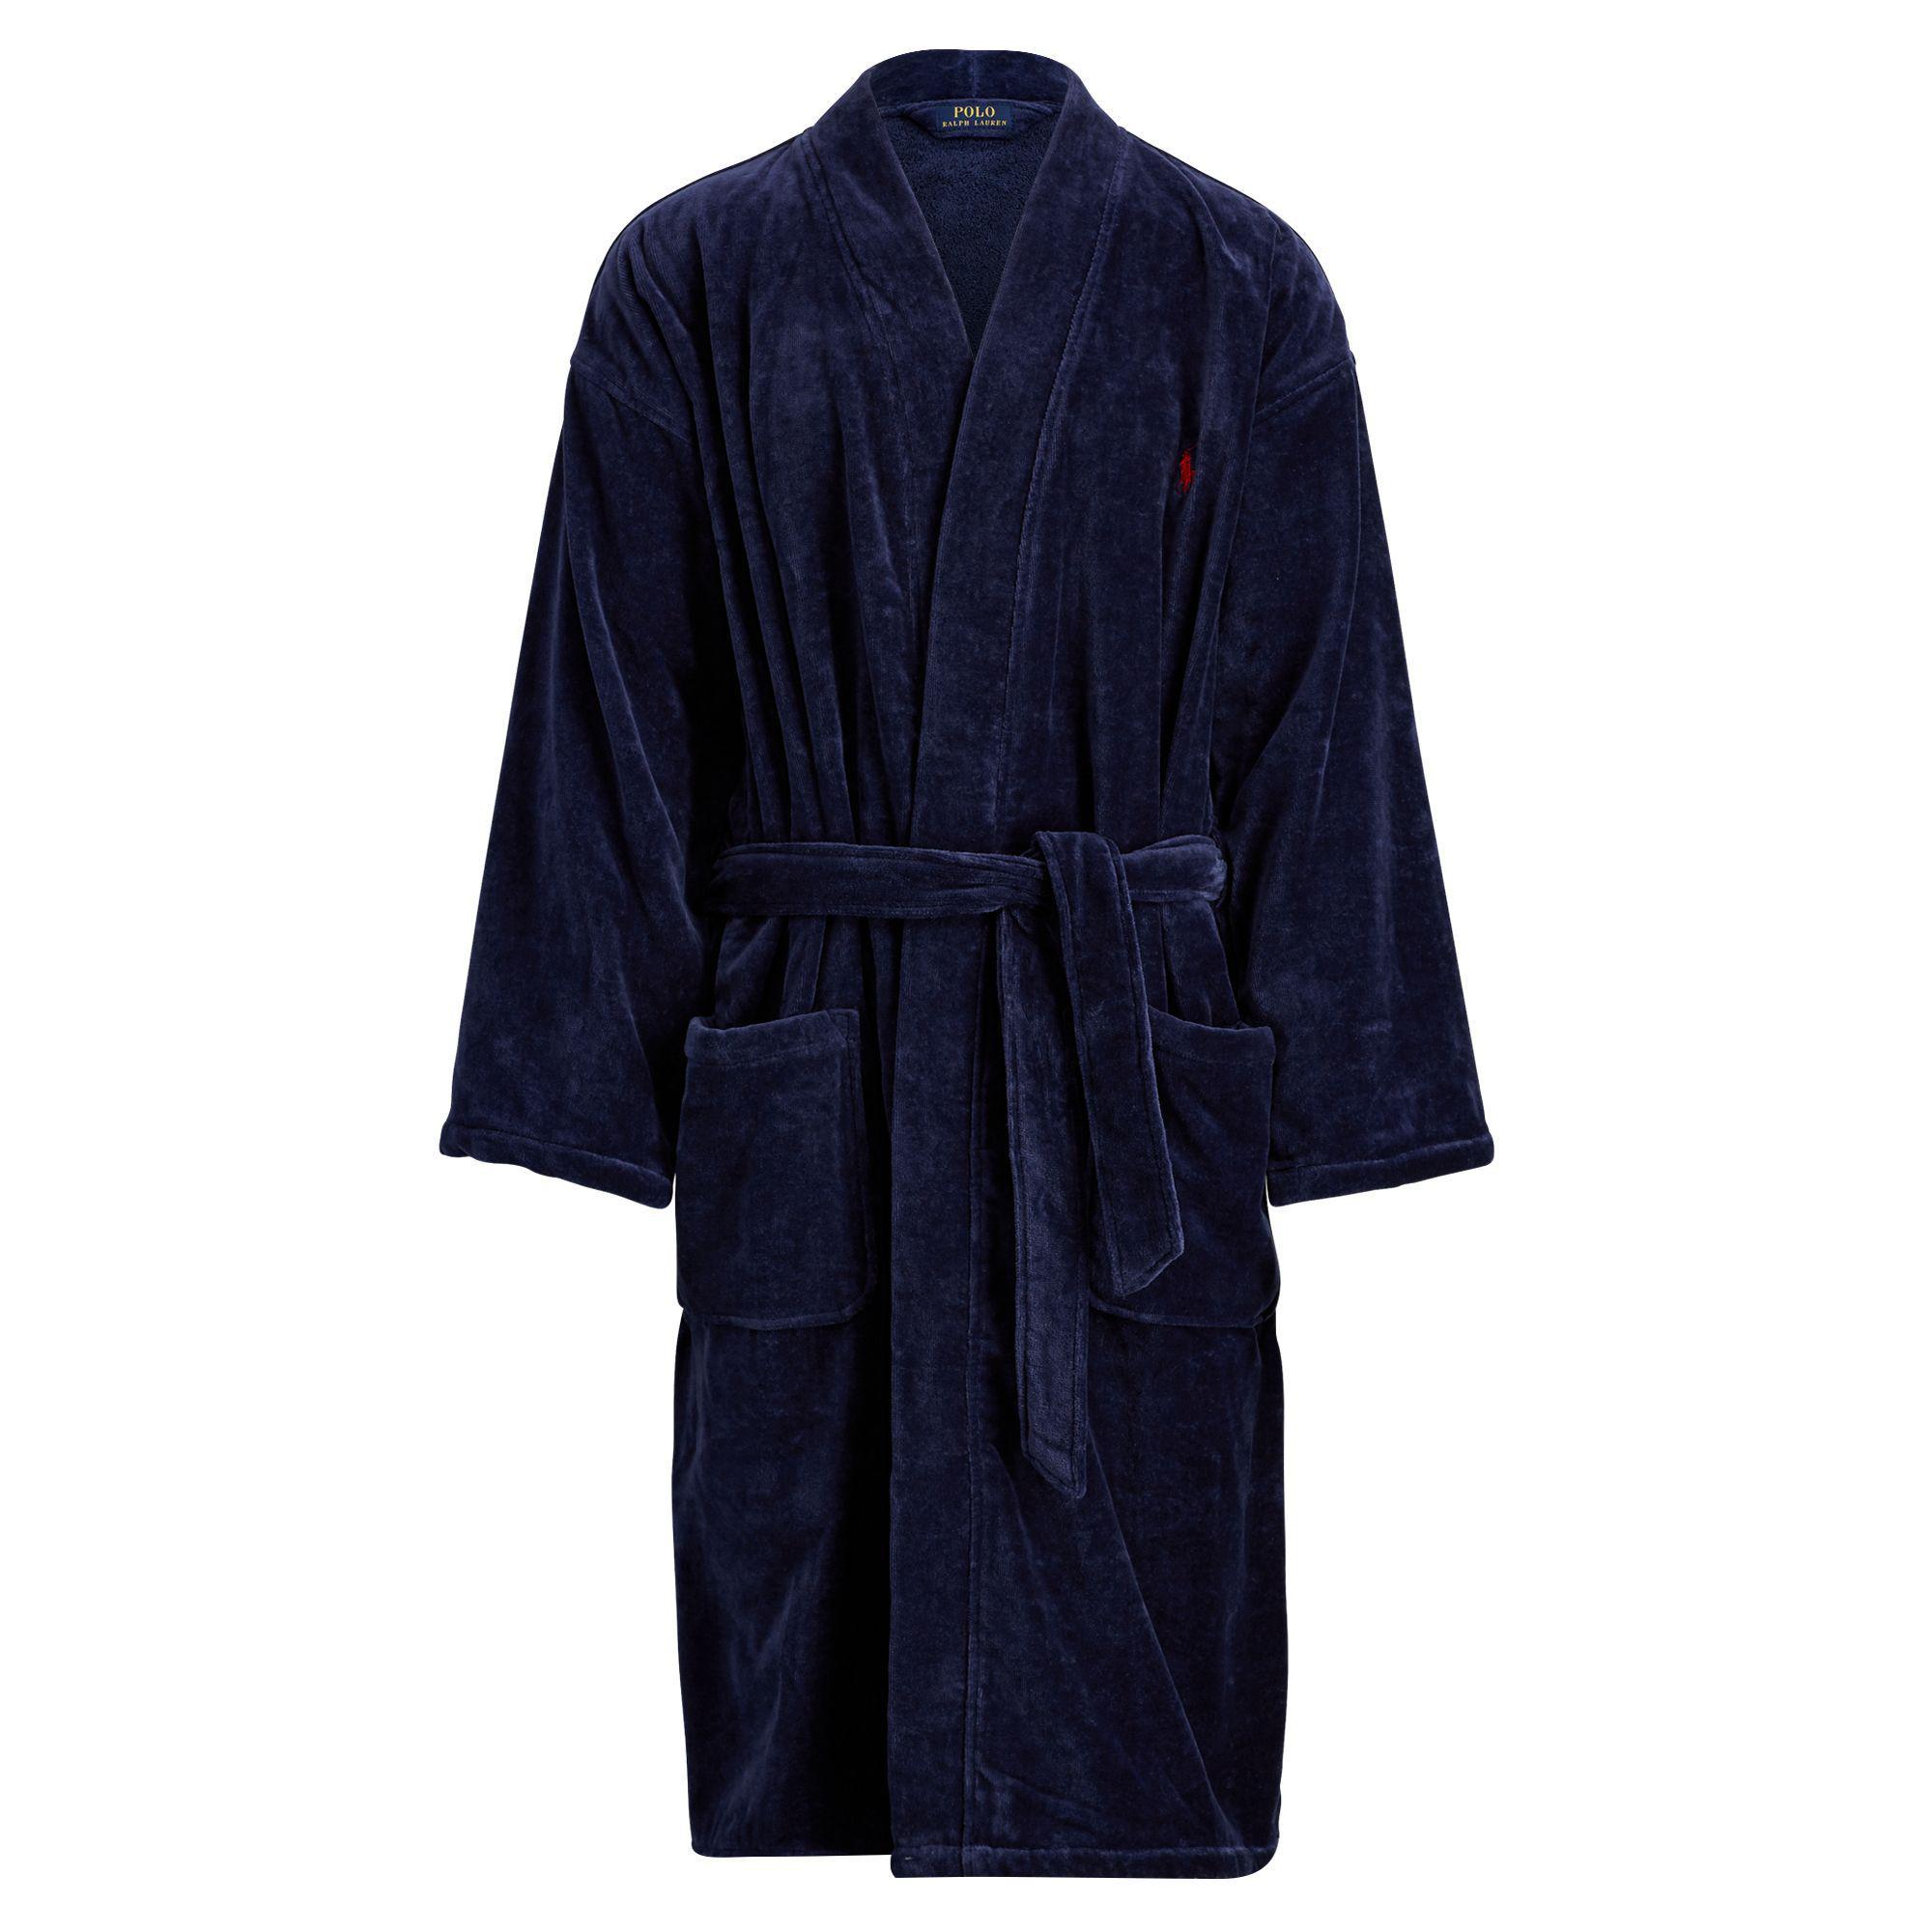 Lyst - Polo Ralph Lauren Terry Kimono Robe in Black for Men 58a01851524